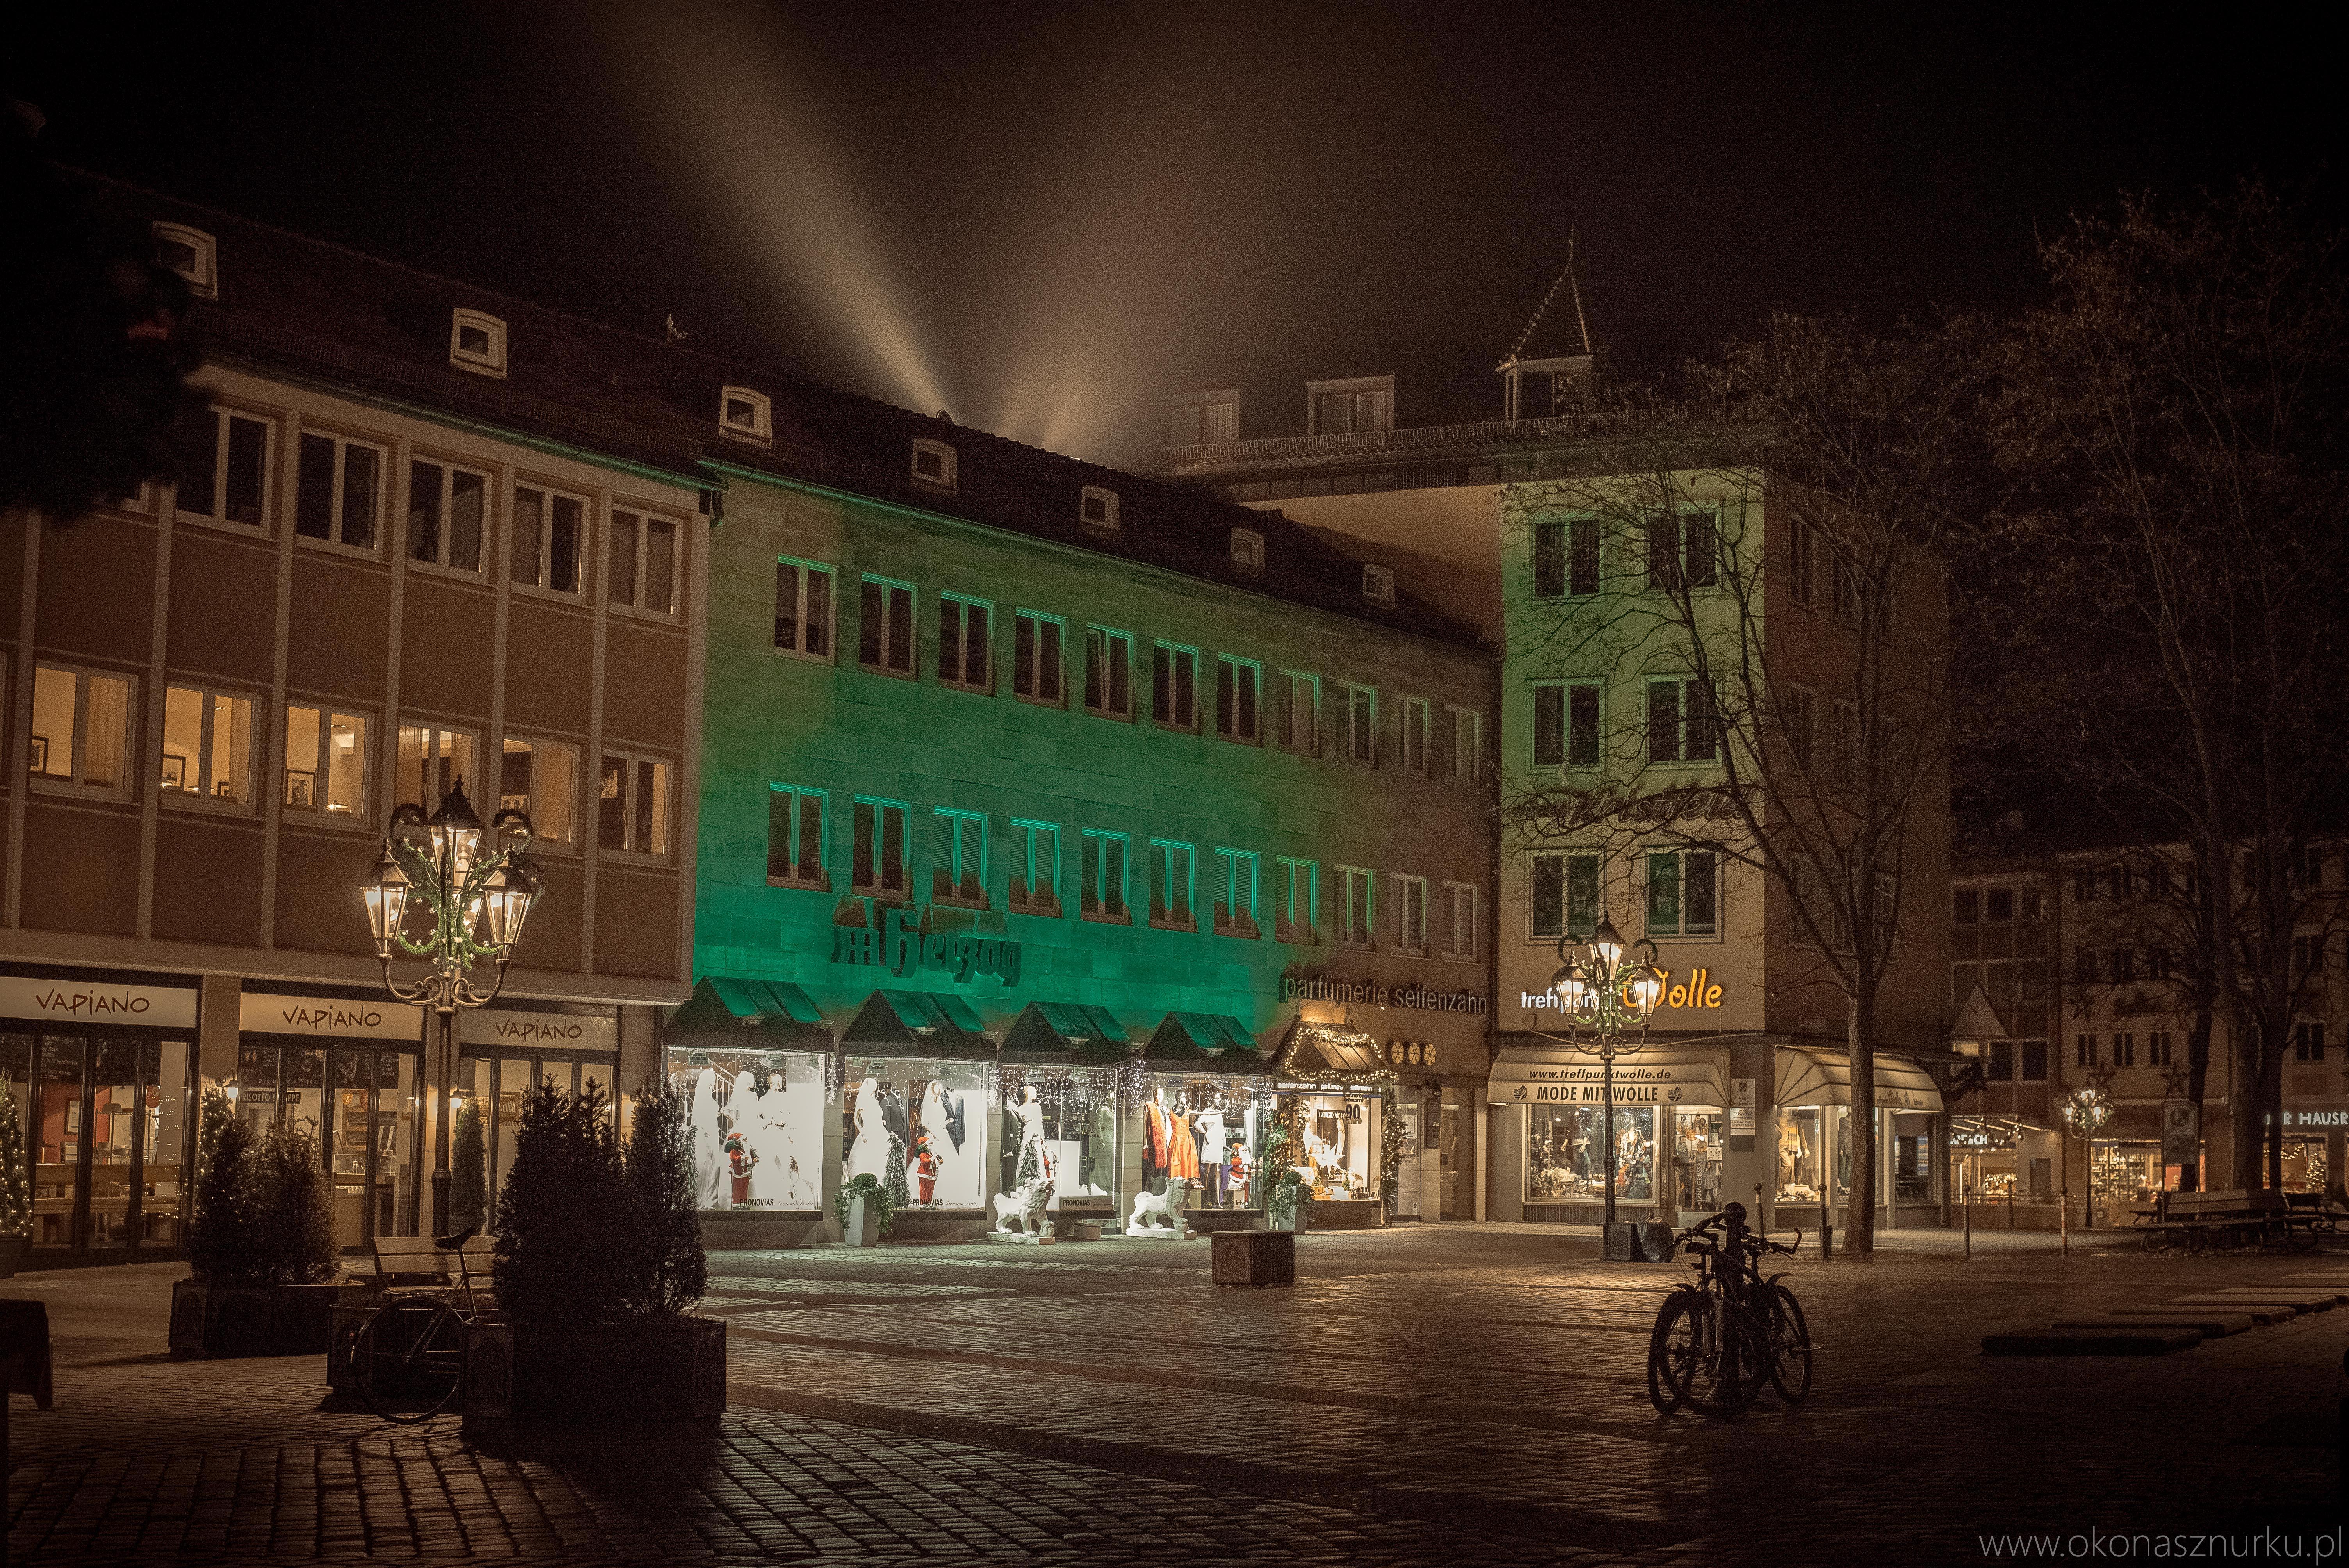 Nürnberg-stadt-norymberga-bayern-city-frankonia (33)